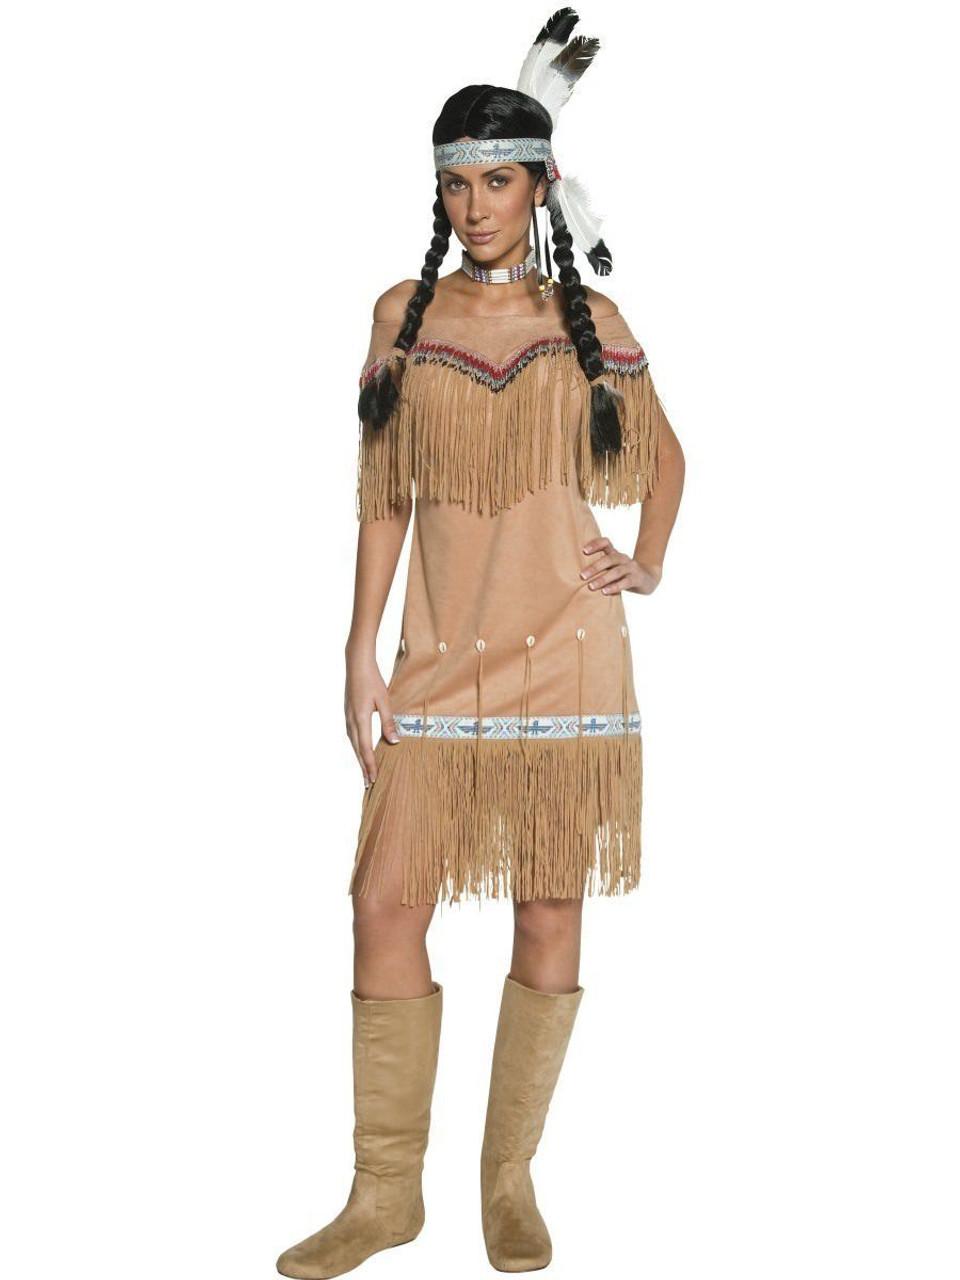 Woman Girl Indian Native American Wild Western Fancy Dress Halloween Costume